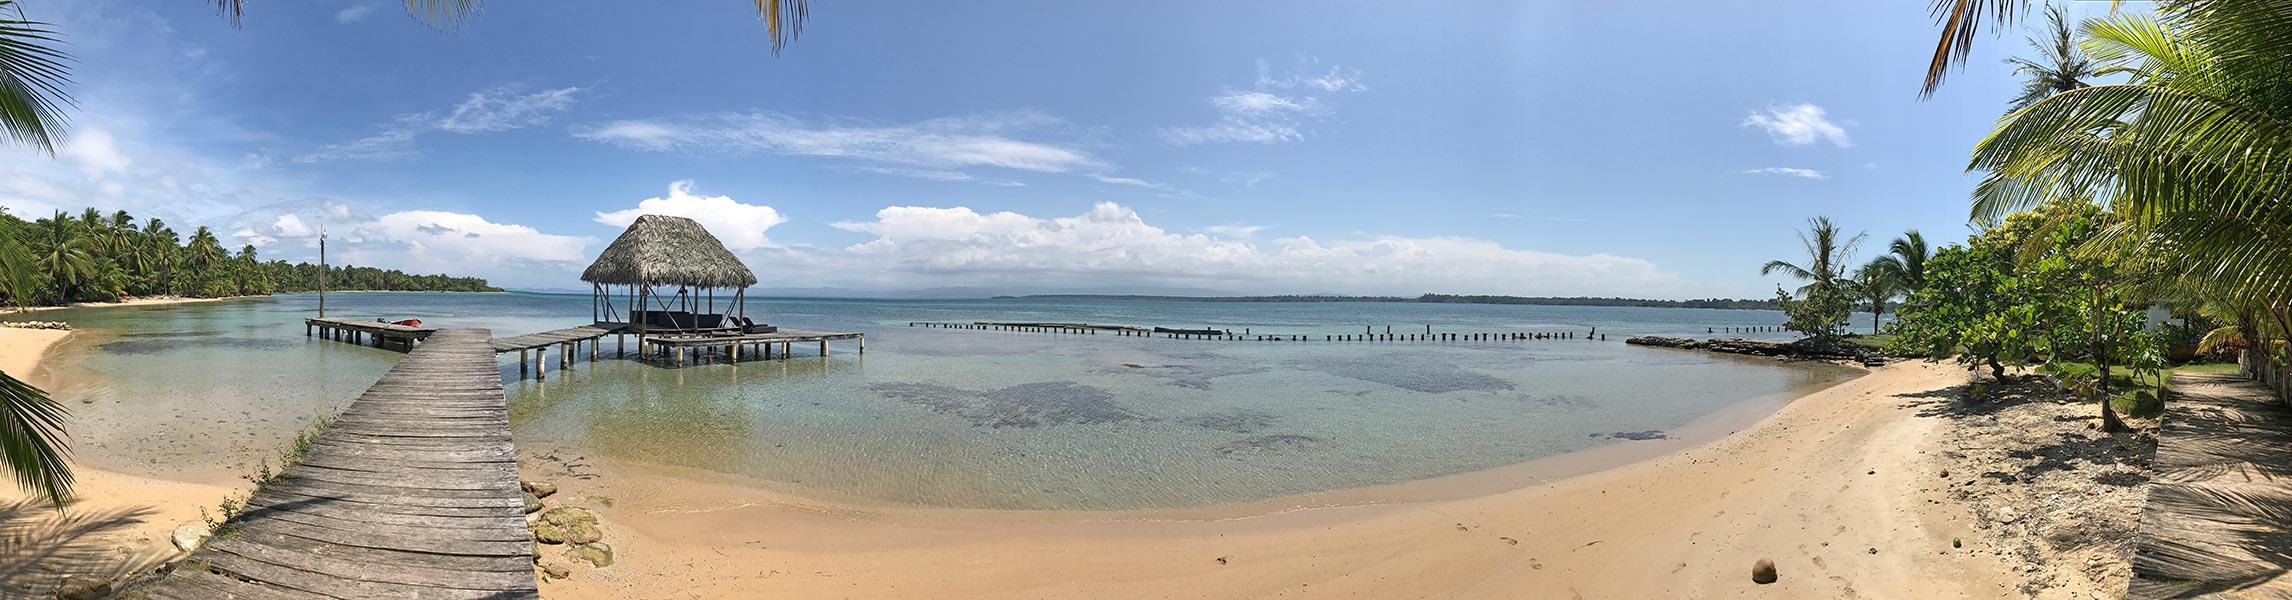 walking to Starfish Beach on Isla Colon, Bocas del Toro, Panama